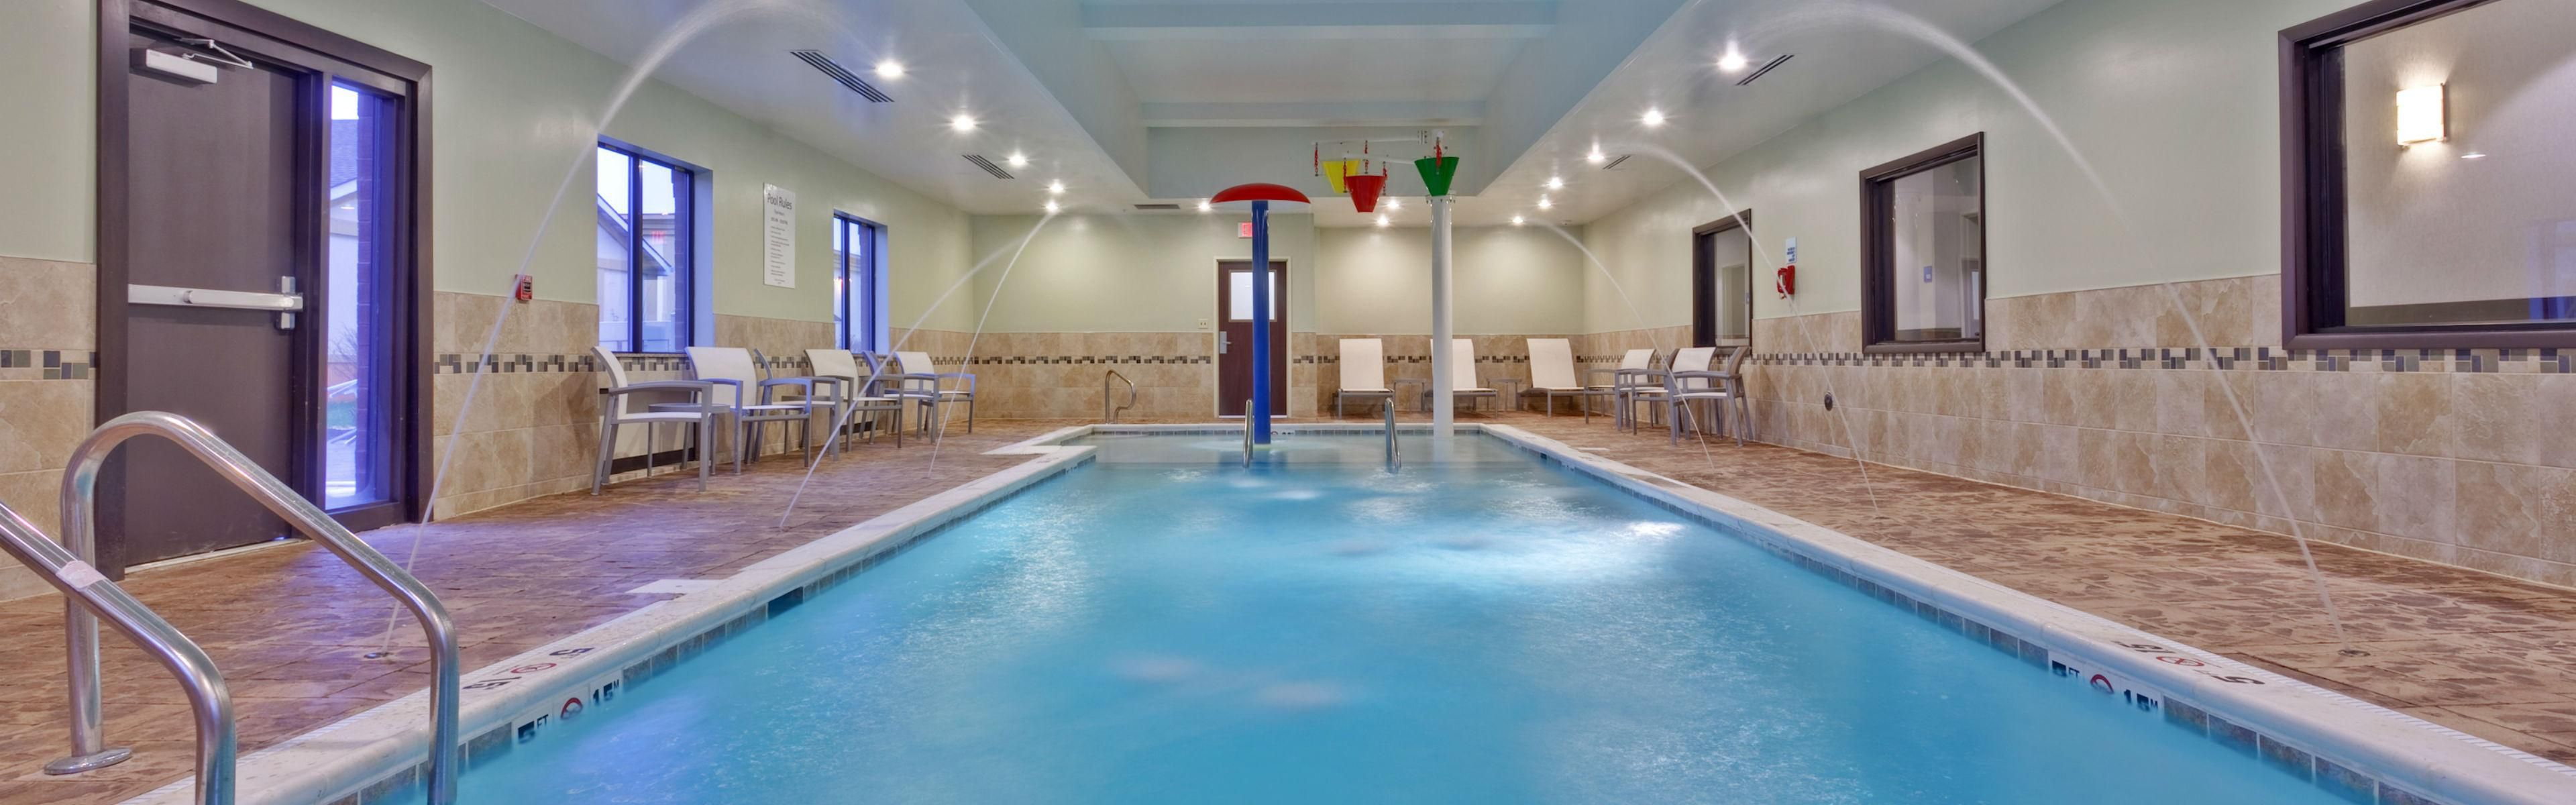 Holiday Inn Express & Suites New Philadelphia image 2